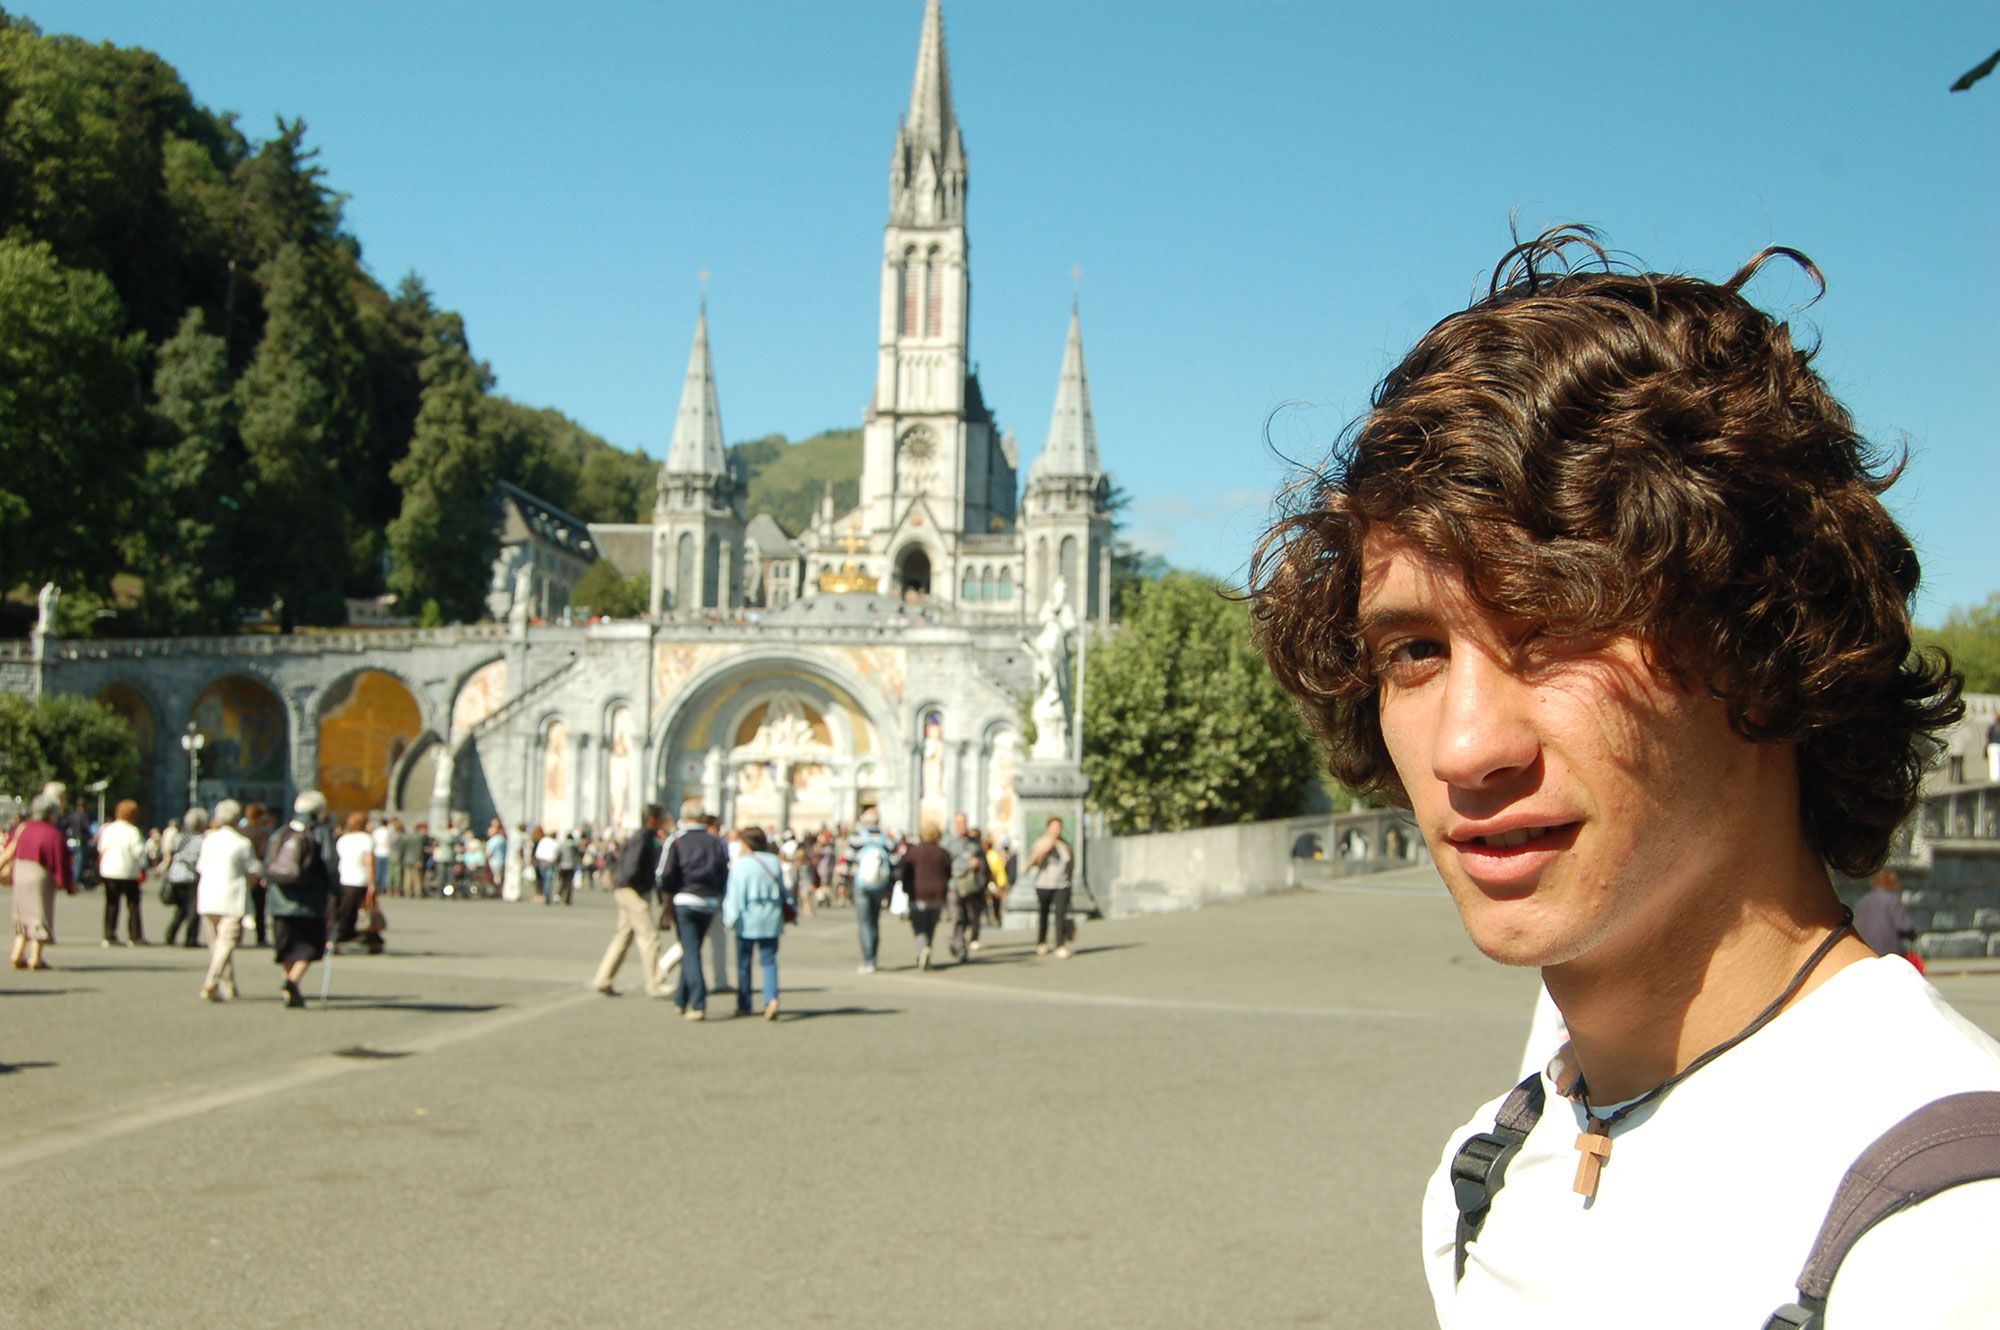 Santuario de Lourdes 2017